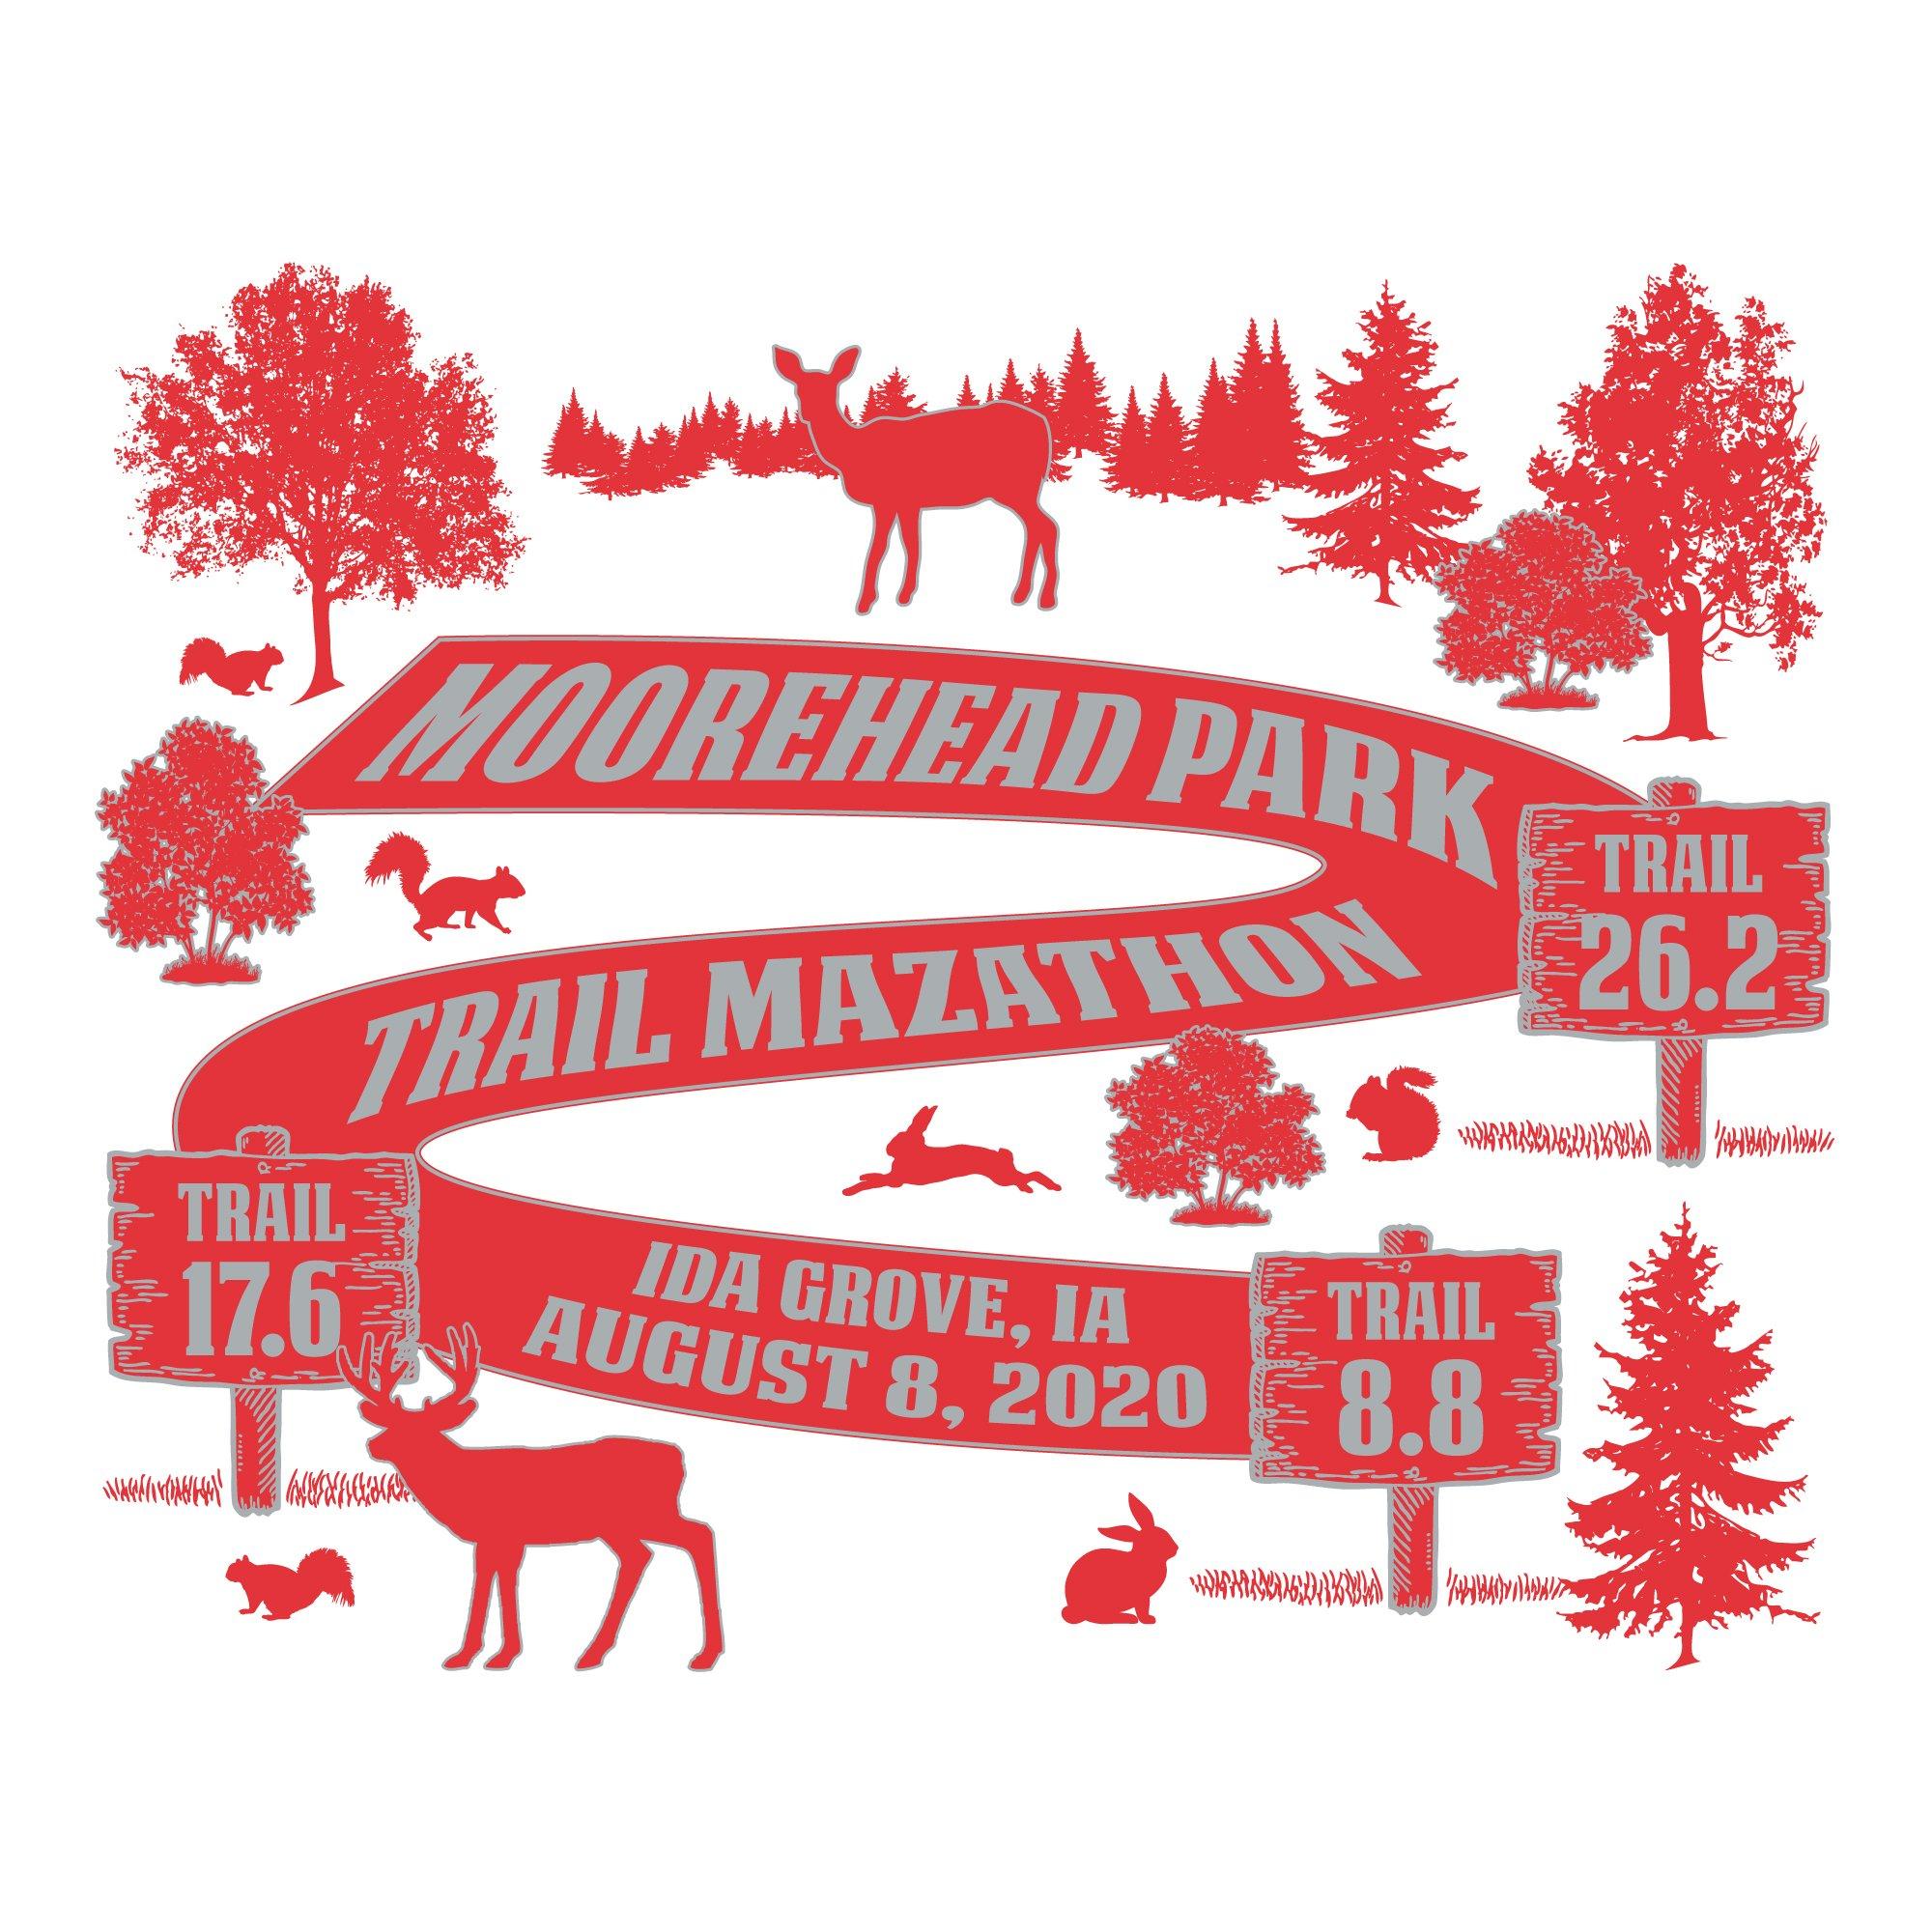 moorehead park trail mazathon logo